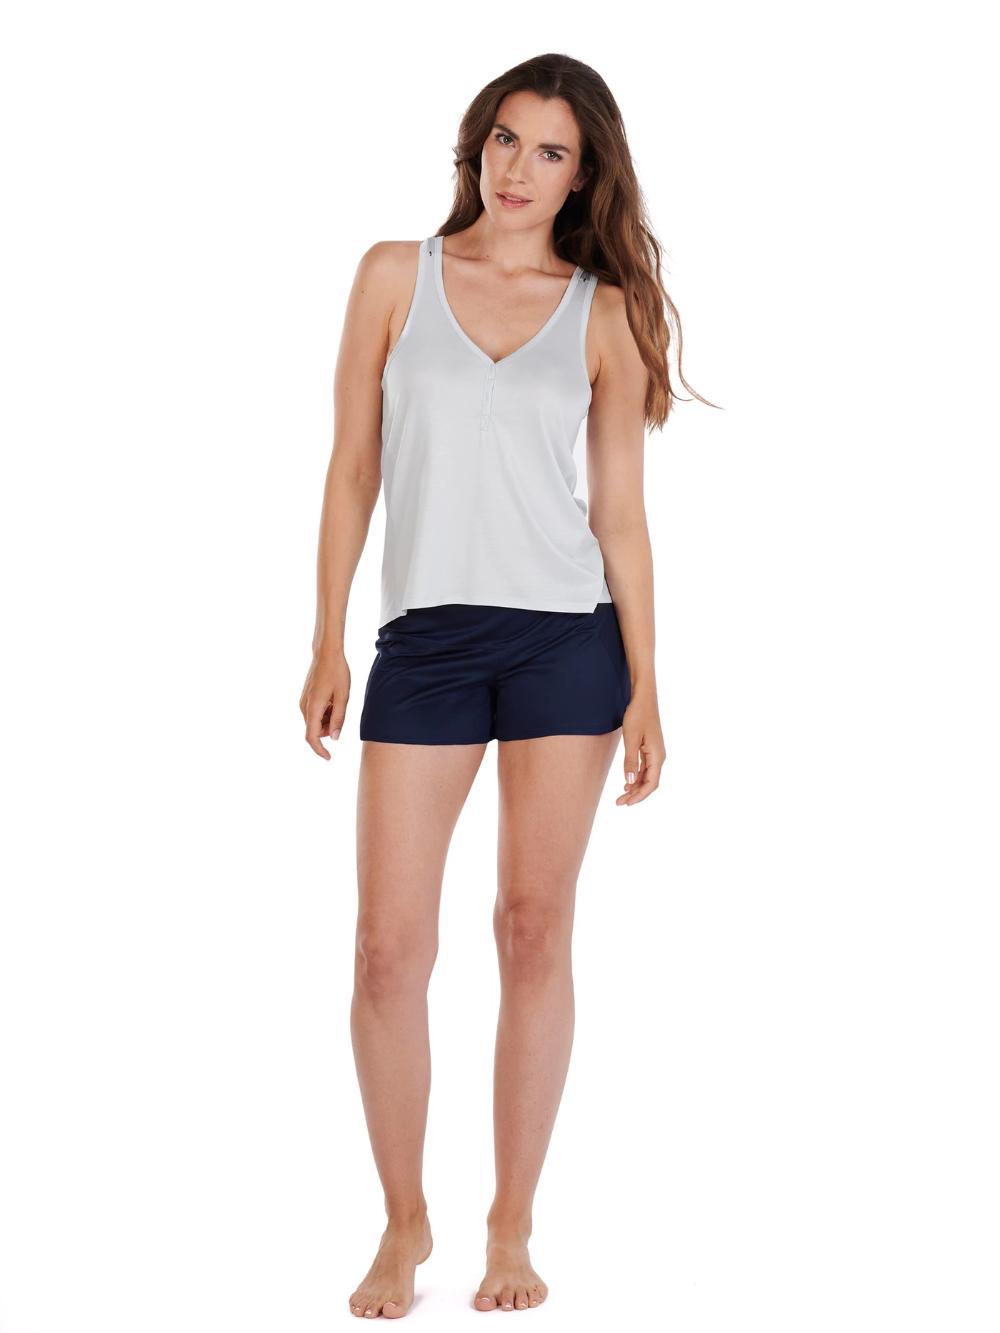 Shorts Women Nattcool Sleep Tech Best Tank Tops Pajamas Women